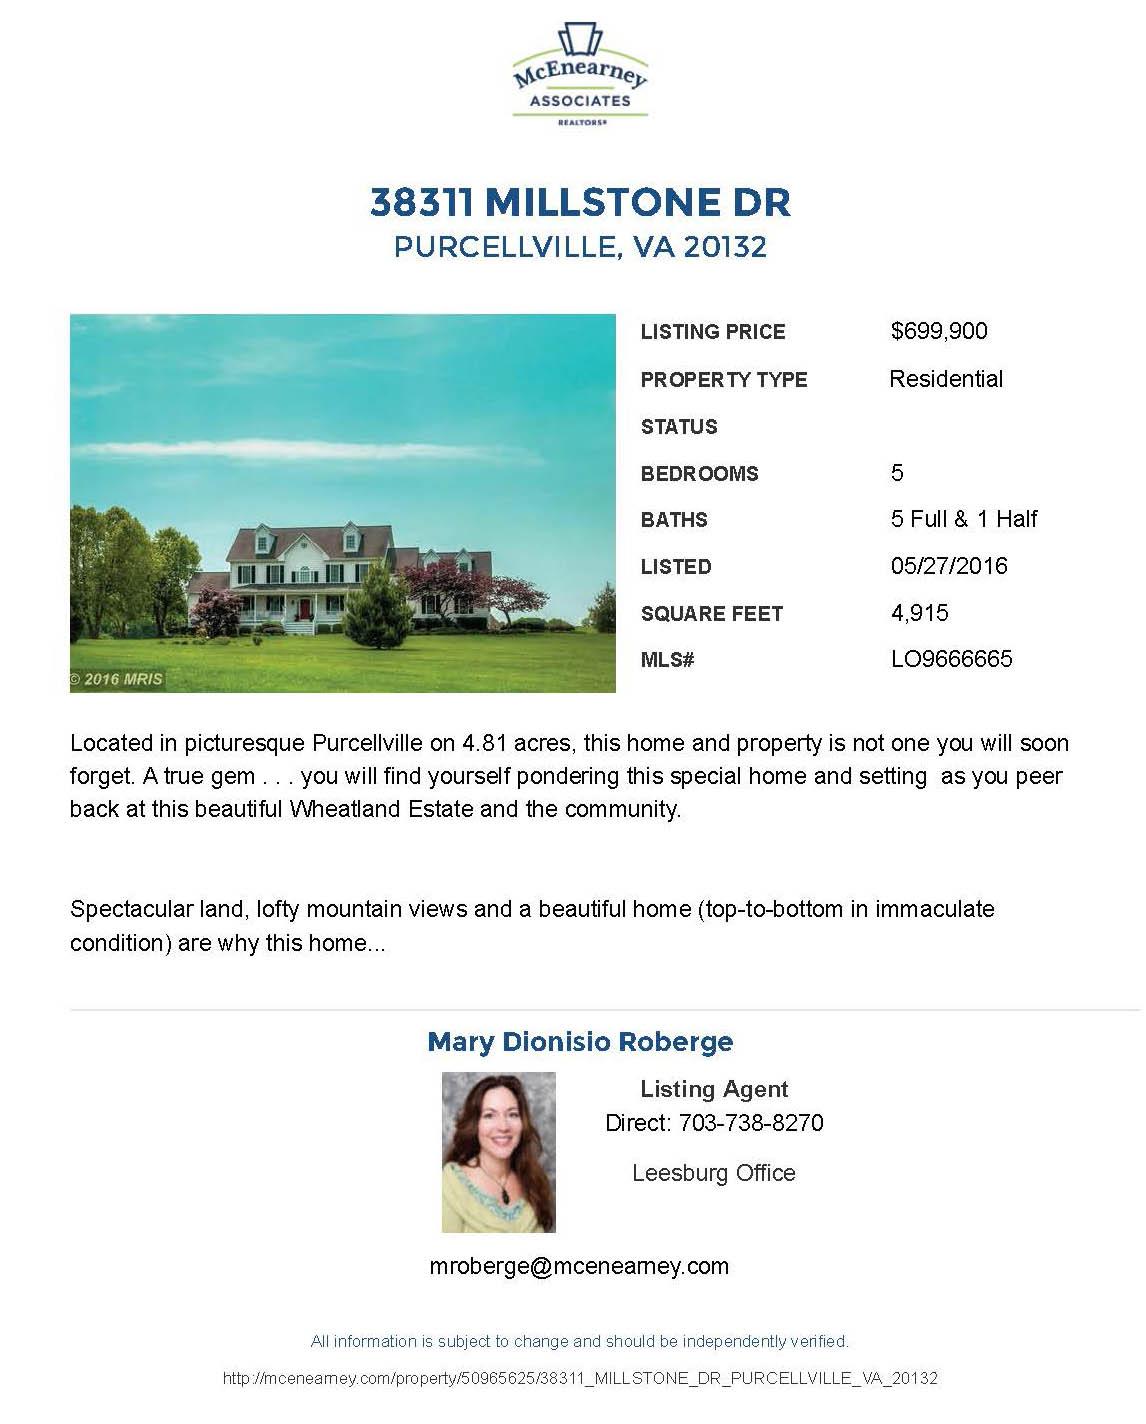 38311 Millstone Dr Purcellville, VA 20132.jpg